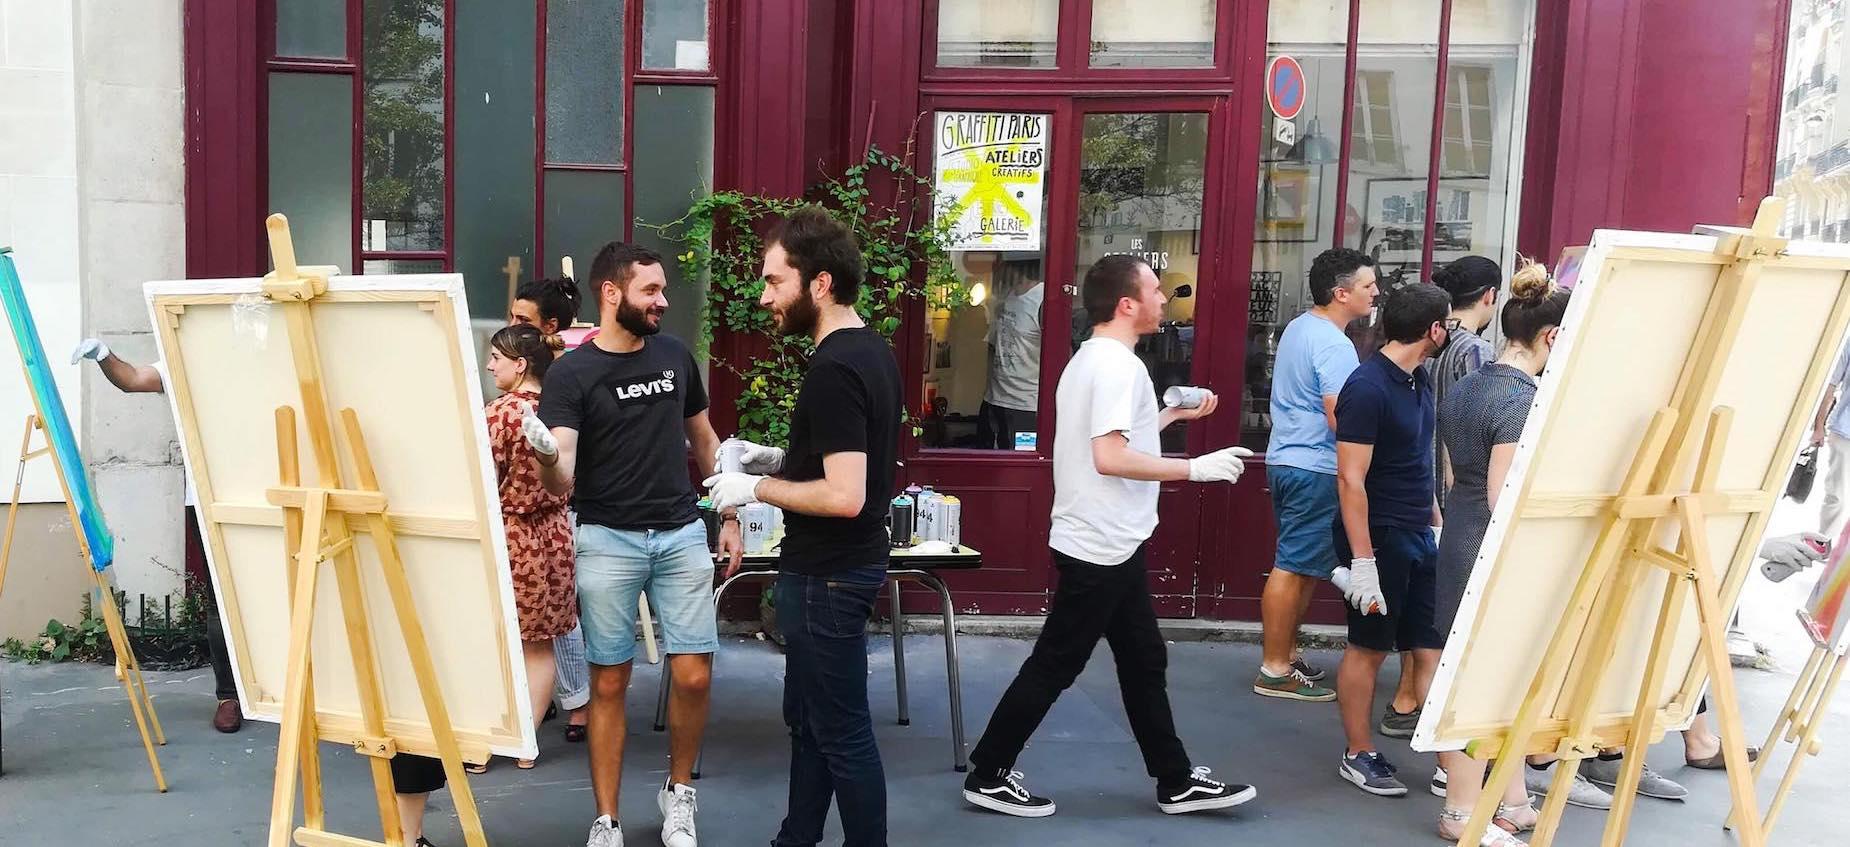 atelier fresque street art paris